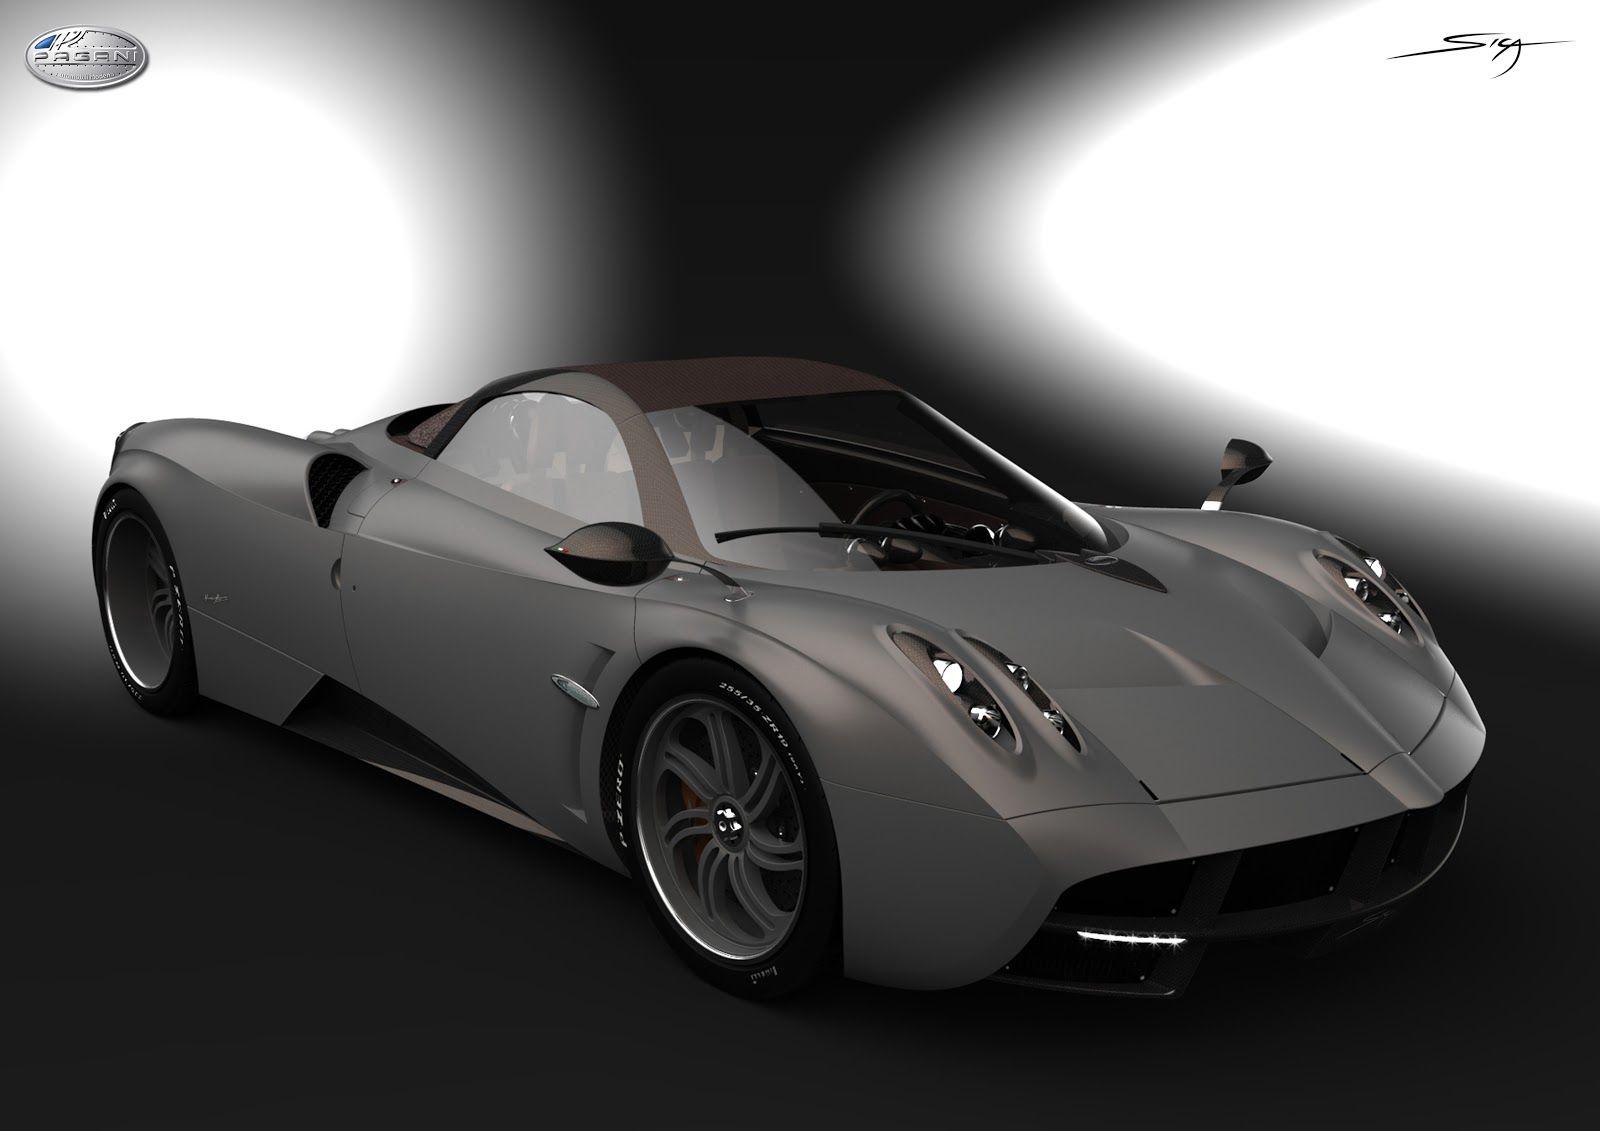 Pagani Huayra Roadster desktop hd wallpaper -   #Pagani  #Desktop, #Hd, #Huayra, #Pagani, #Roadster  http://wallautos.com/pagani-huayra-roadster-desktop-hd.html